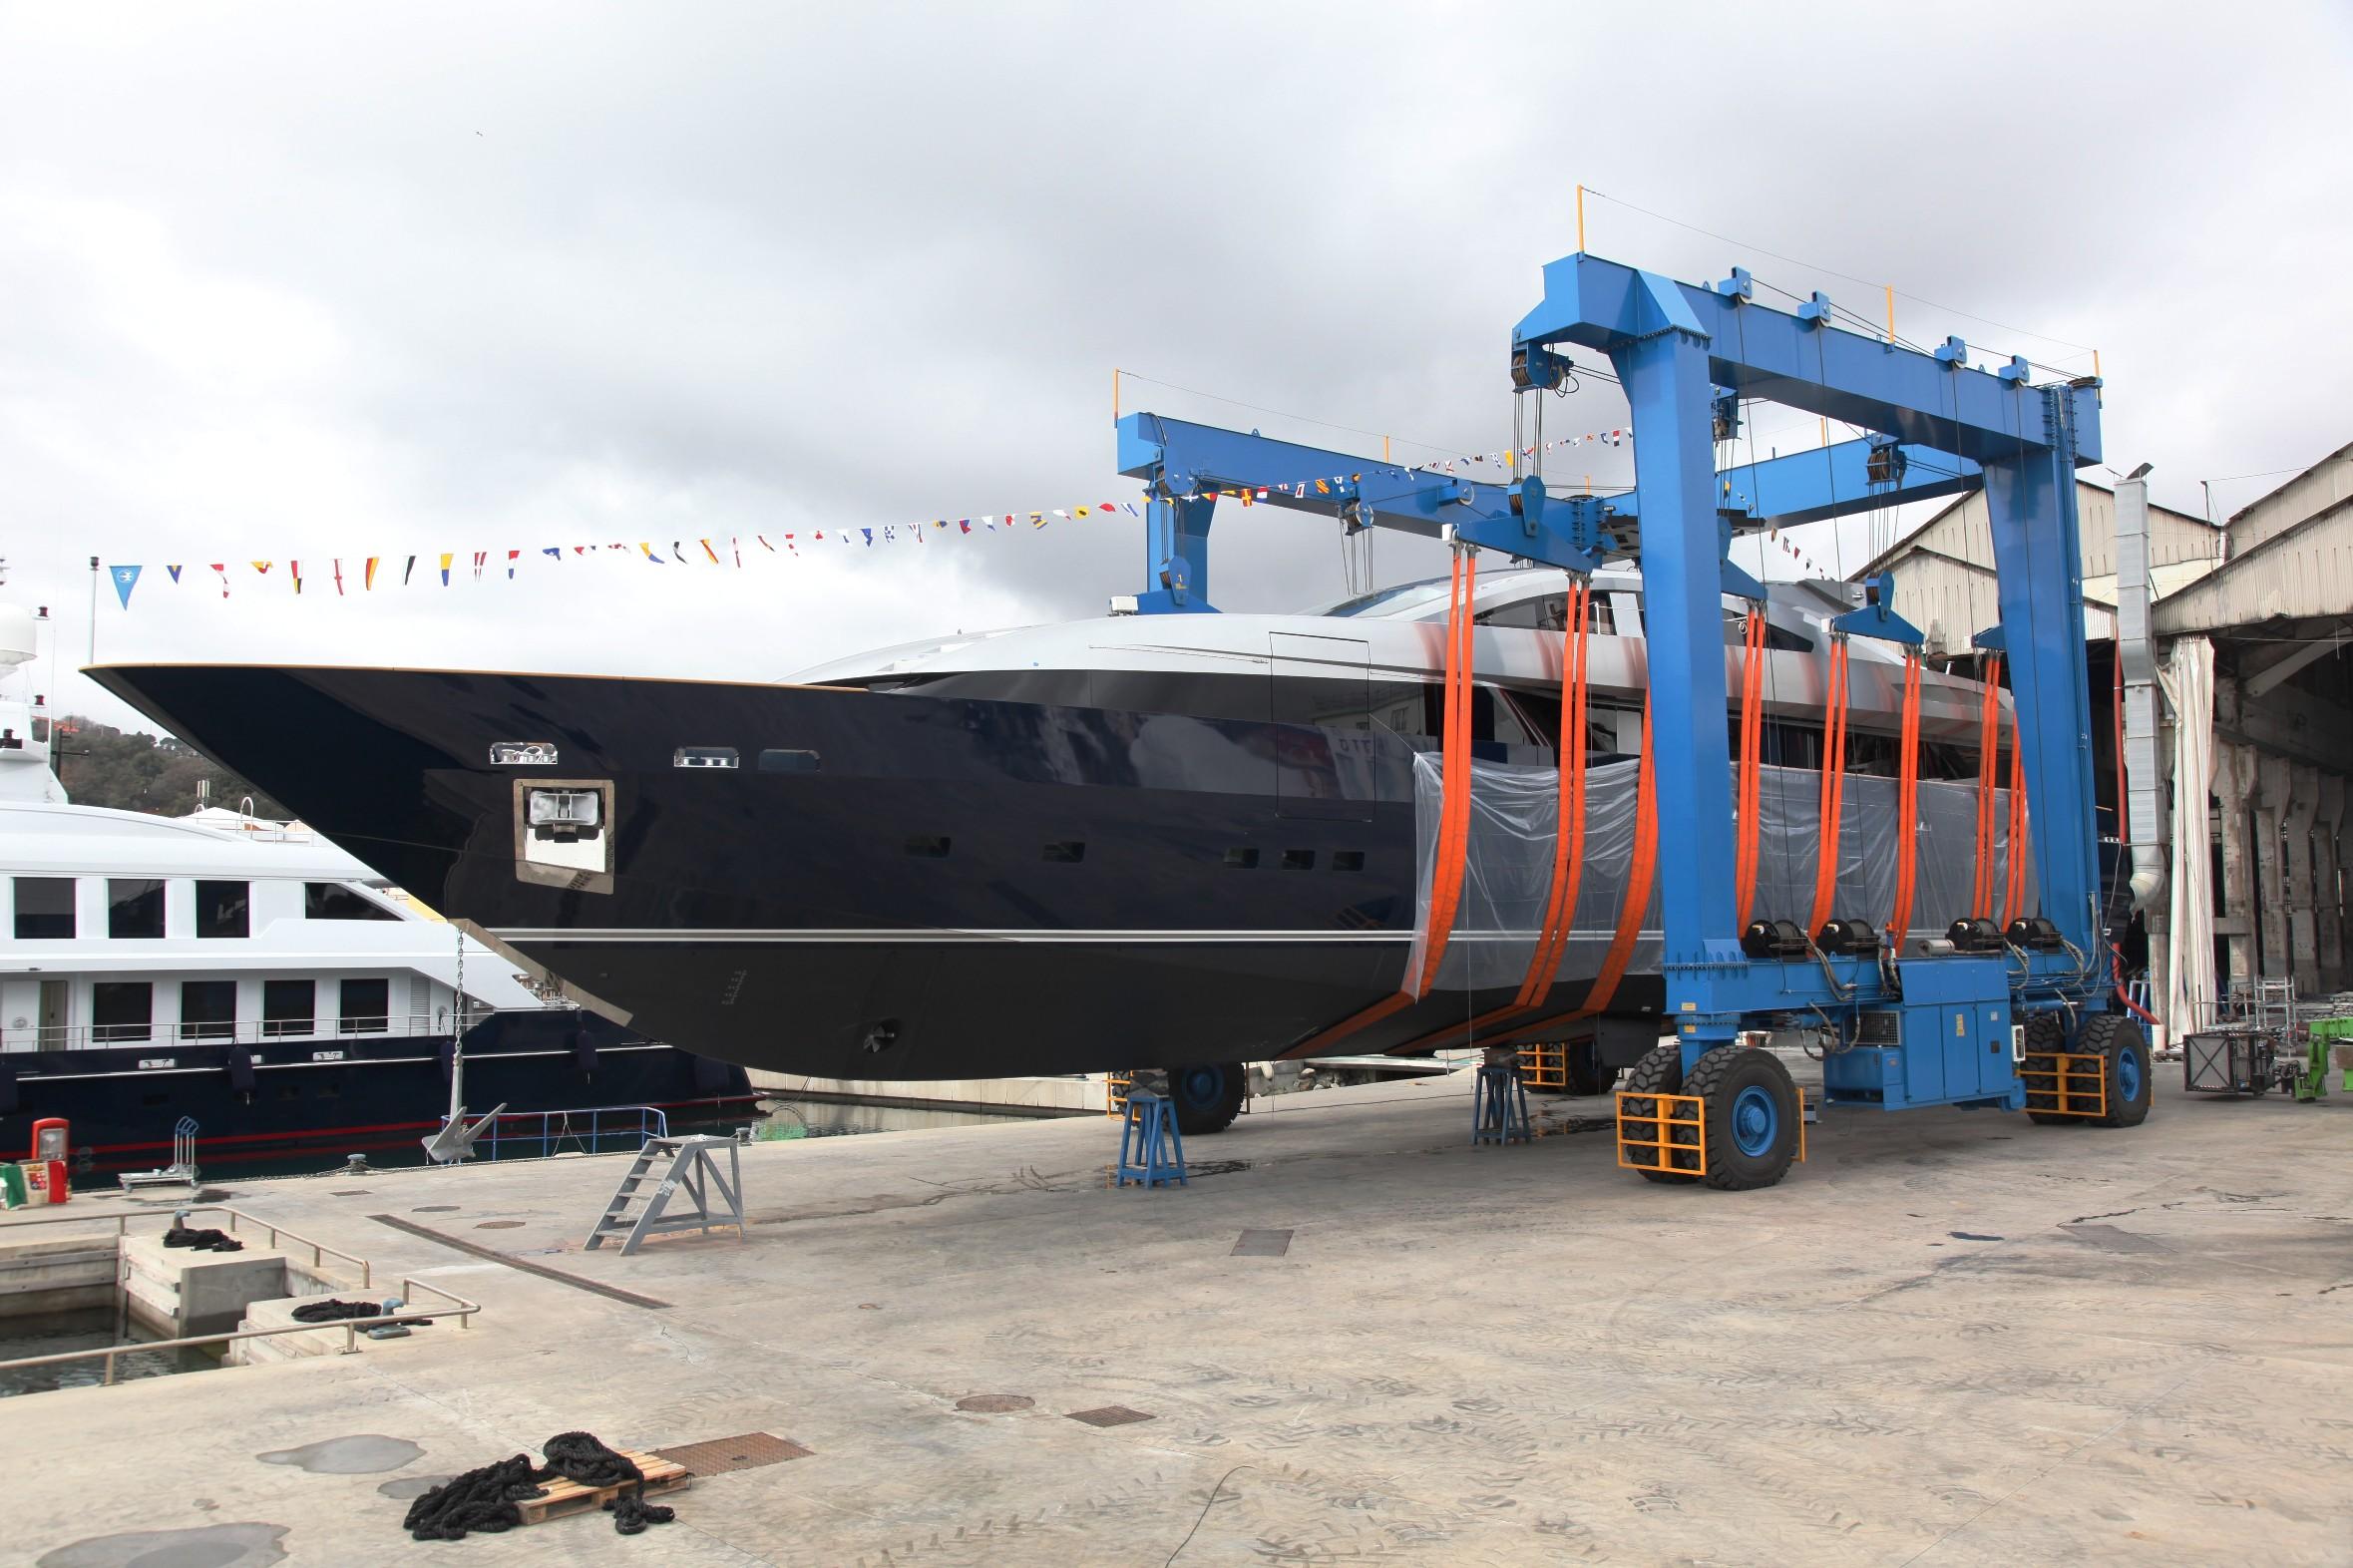 Baglietto Super Yacht LUCKY ME · MotorYacht Ferretti 500 and MotorYacht ...